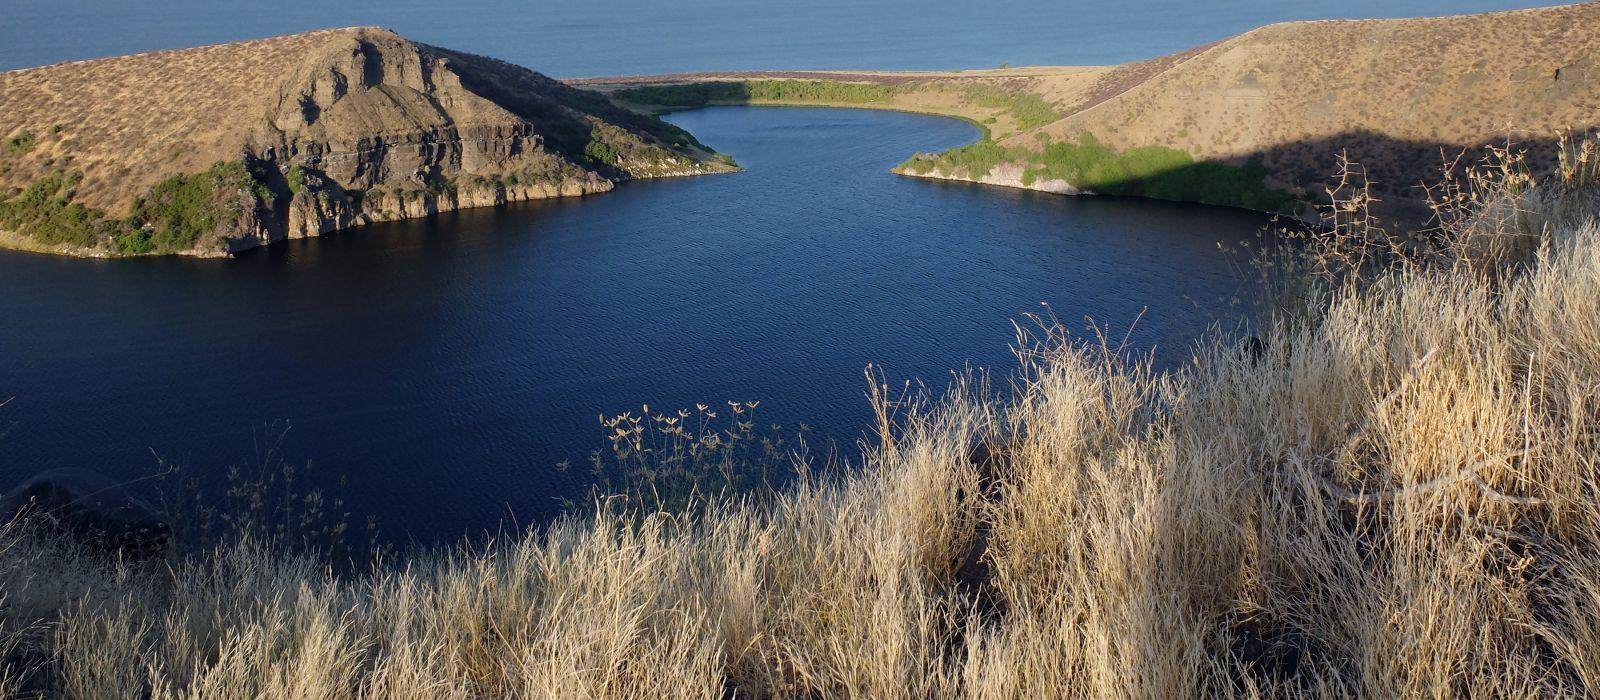 Crocodile lake, Central island national park, Turkana lake, Northern Kenya